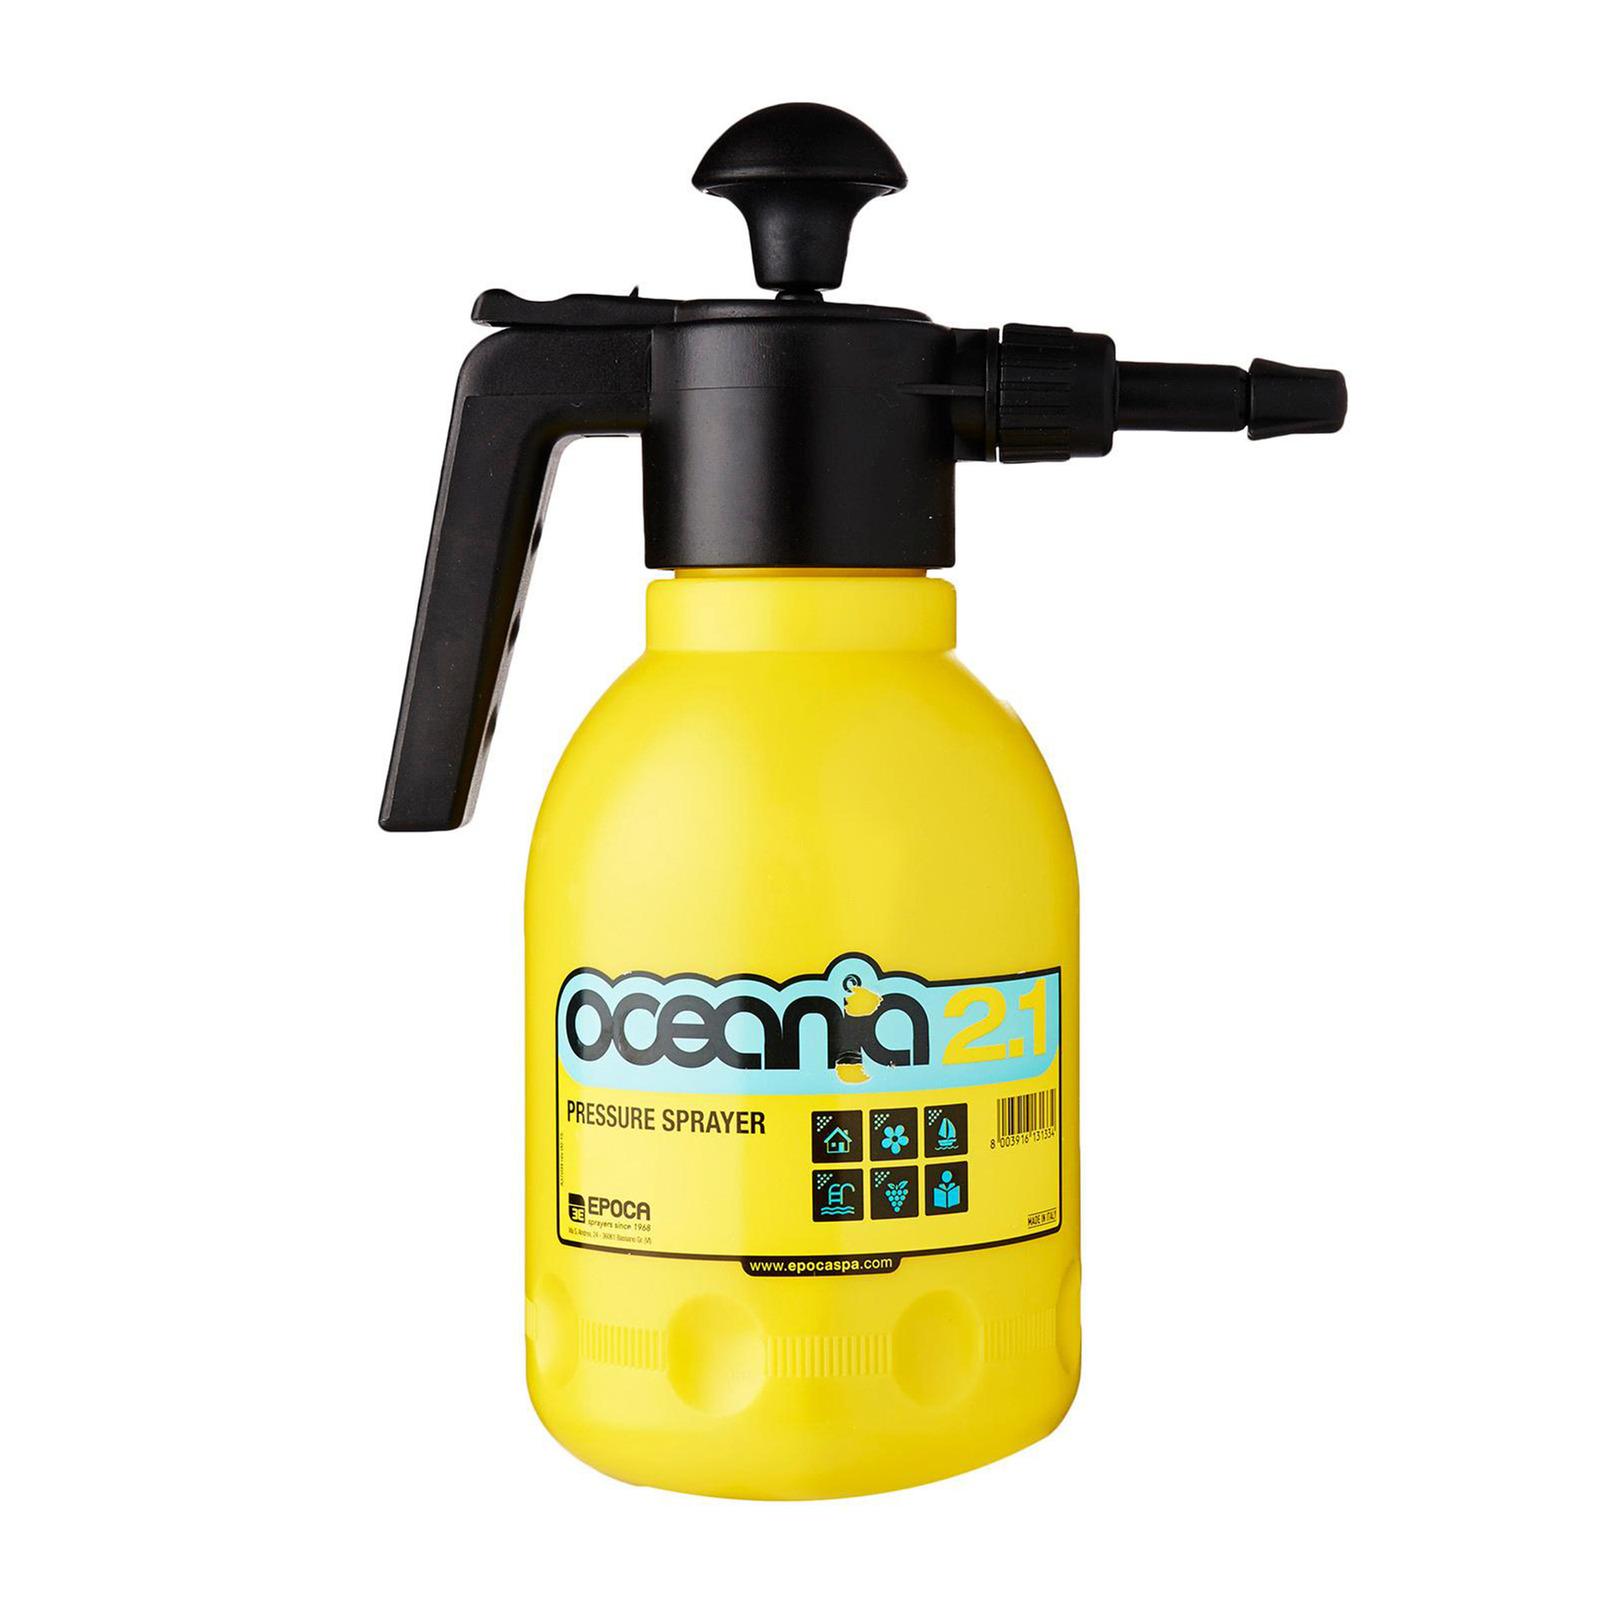 Epoca Oceania - 2.1 Pressure Sprayer (2000ml)